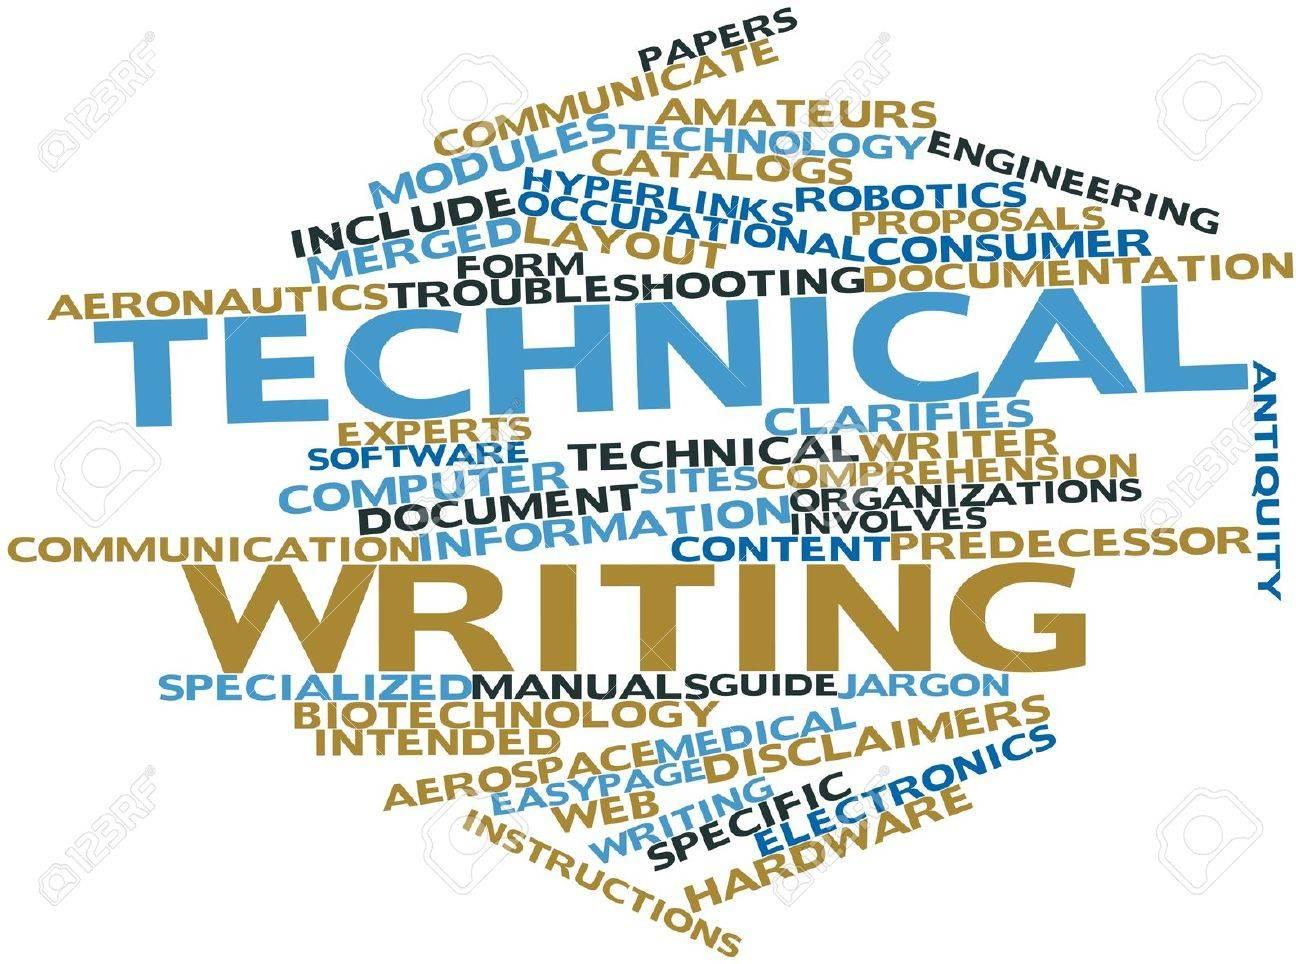 Technical and essay writing expert by Saqibnaseer141